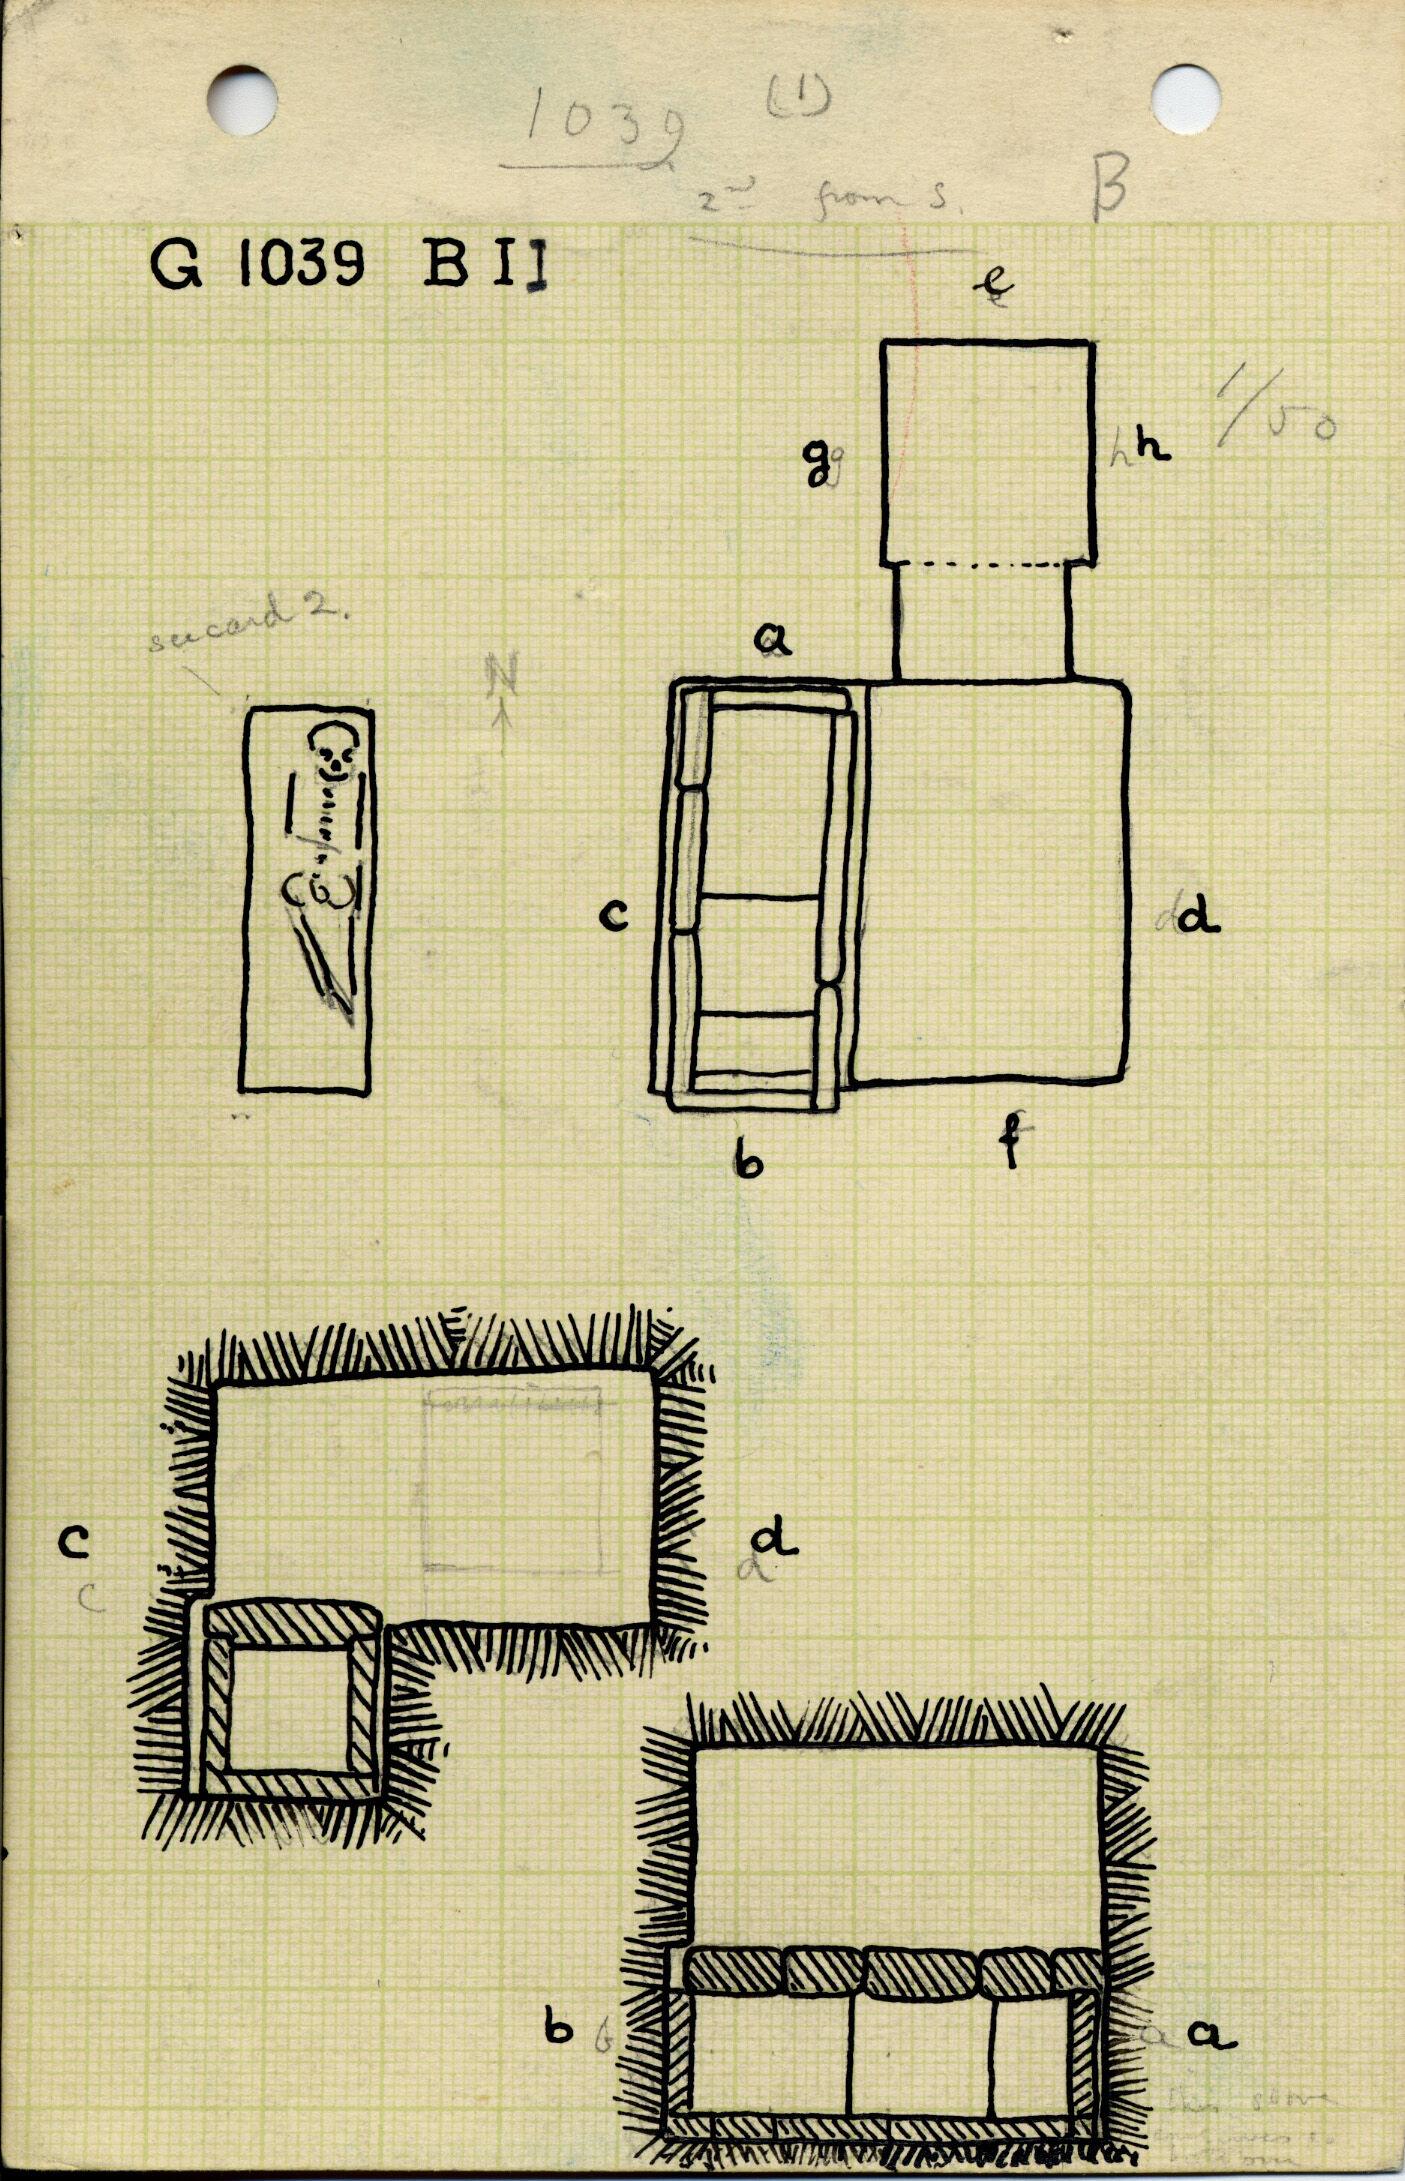 Maps and plans: G 1039, Shaft B (II)